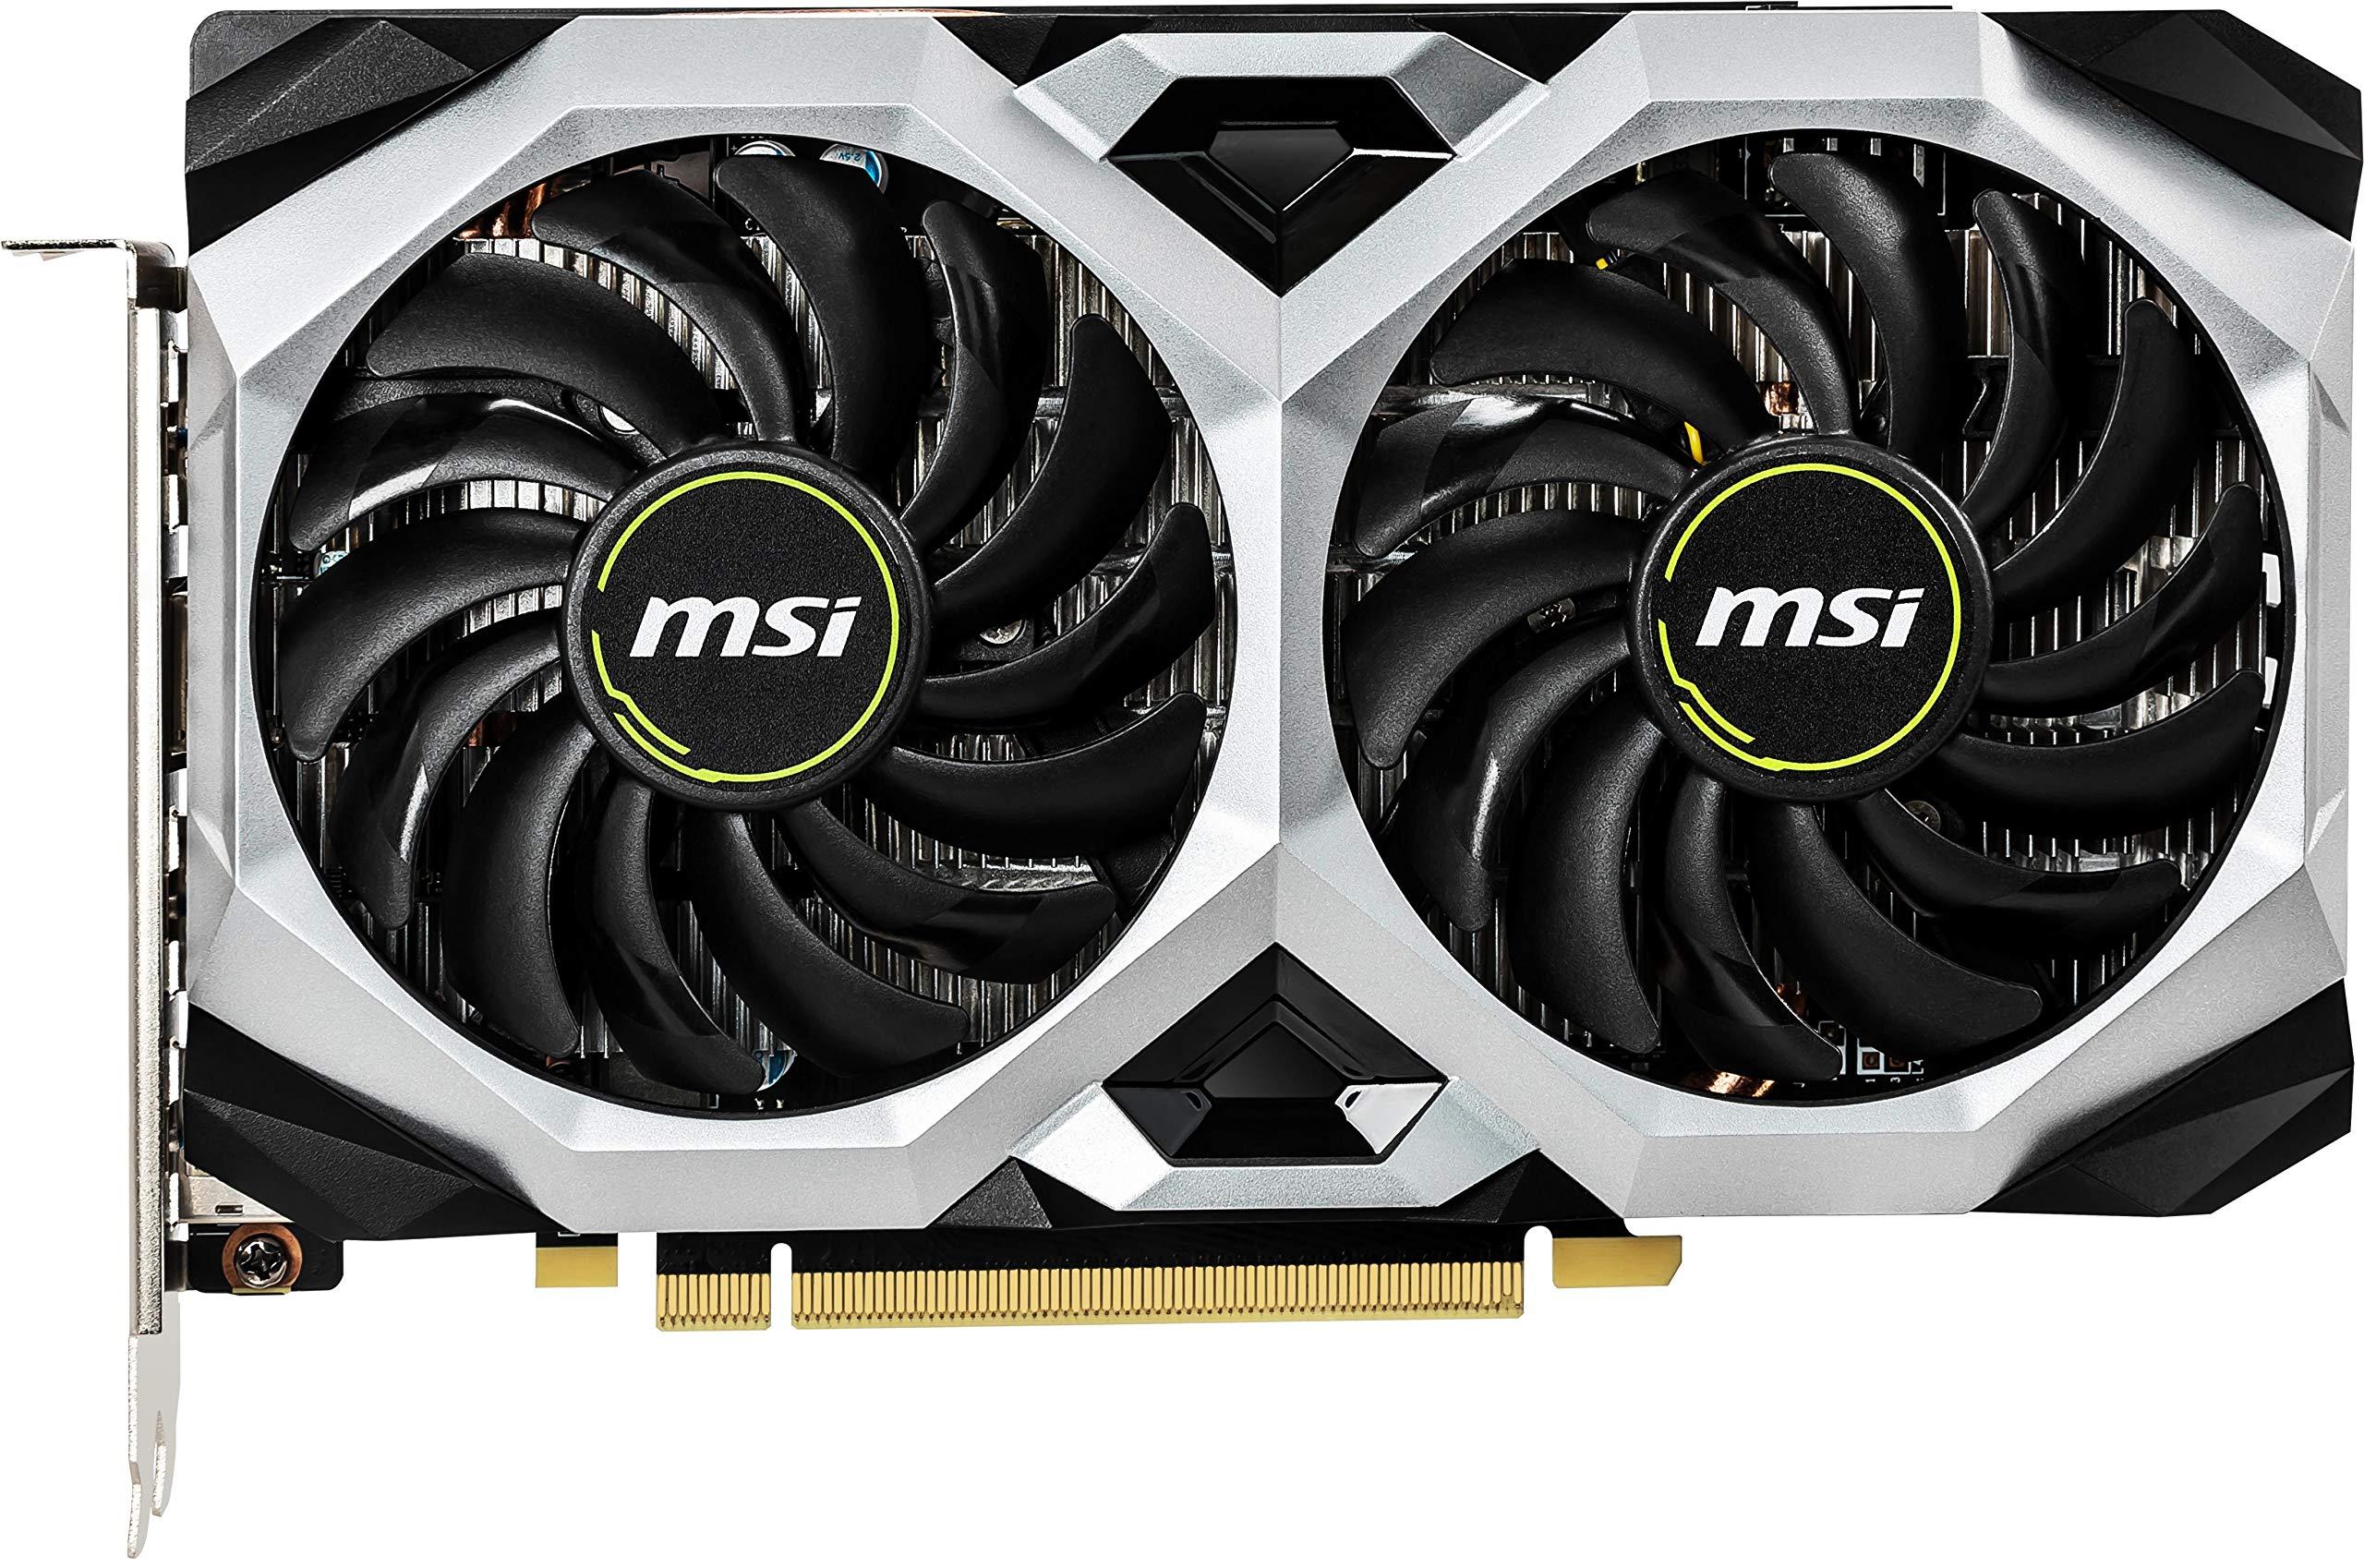 MSI Gaming GeForce GTX 1660 Ti 192-bit HDMI/DP 6GB GDRR6 HDCP Support DirectX 12 Dual Fan VR Ready OC Graphics Card (GTX 1660 TI Ventus XS 6G OC) by MSI (Image #2)